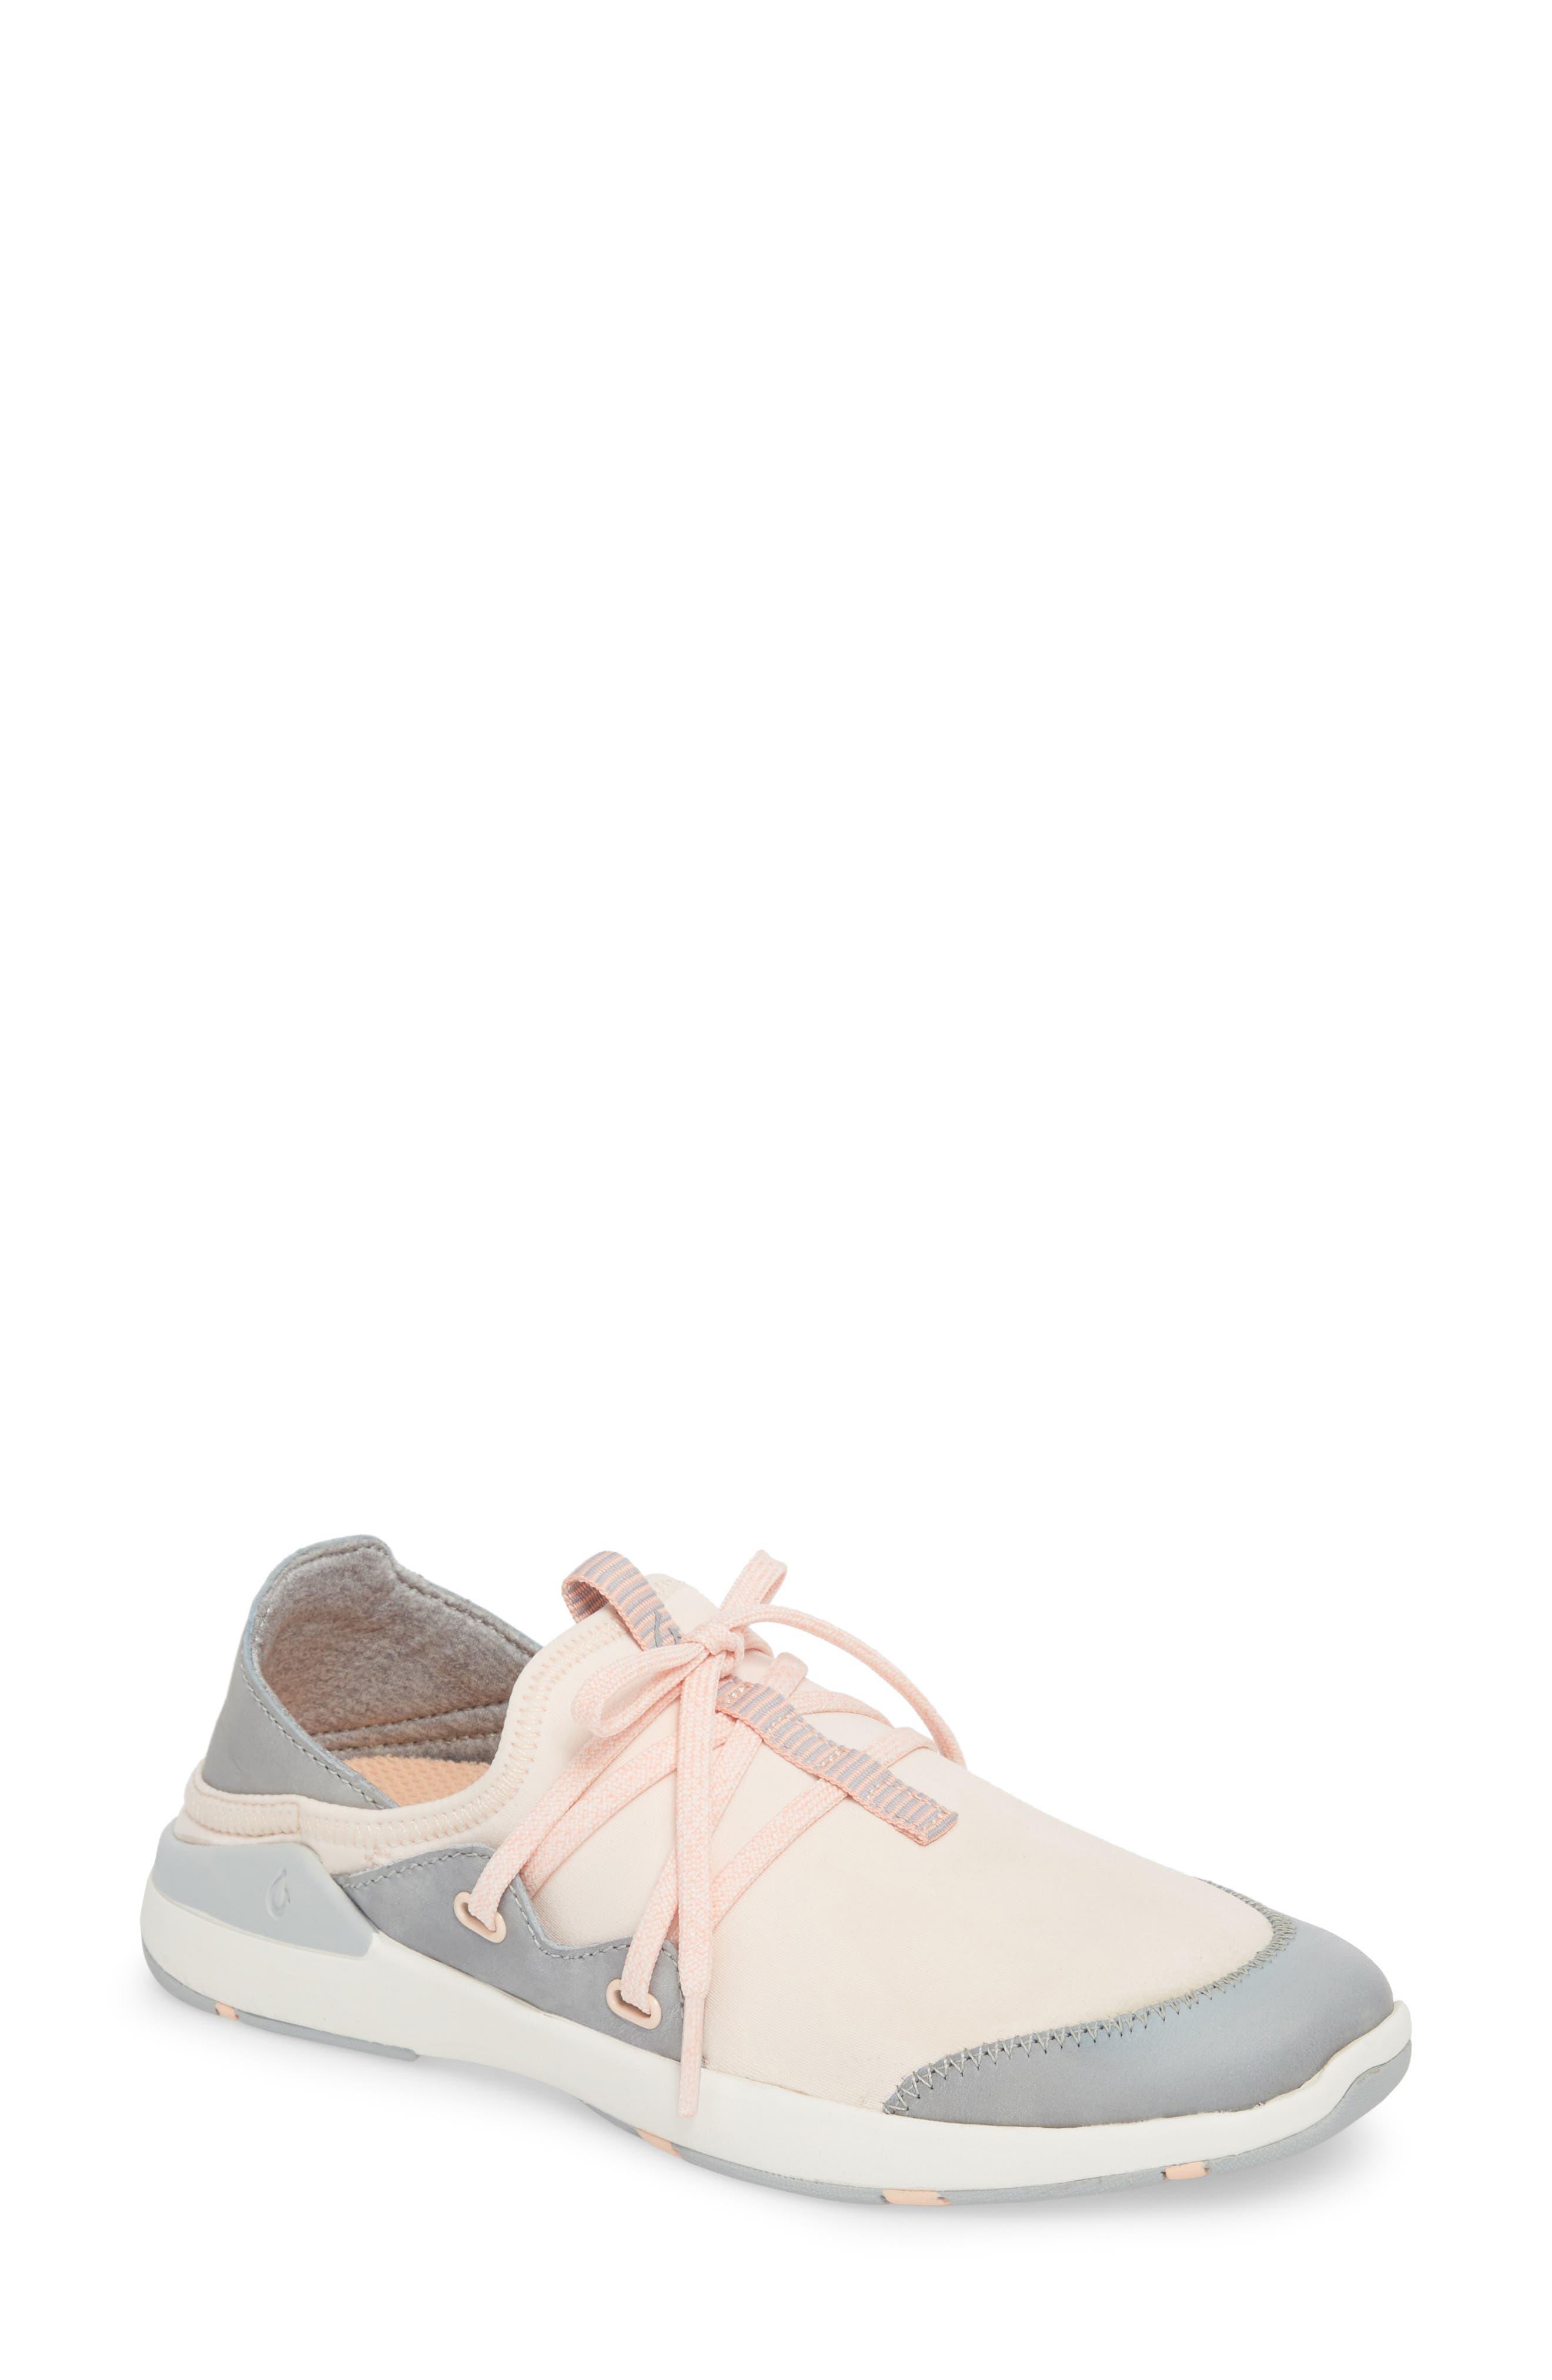 Olukai Miki Li Convertible Sneaker, Pink